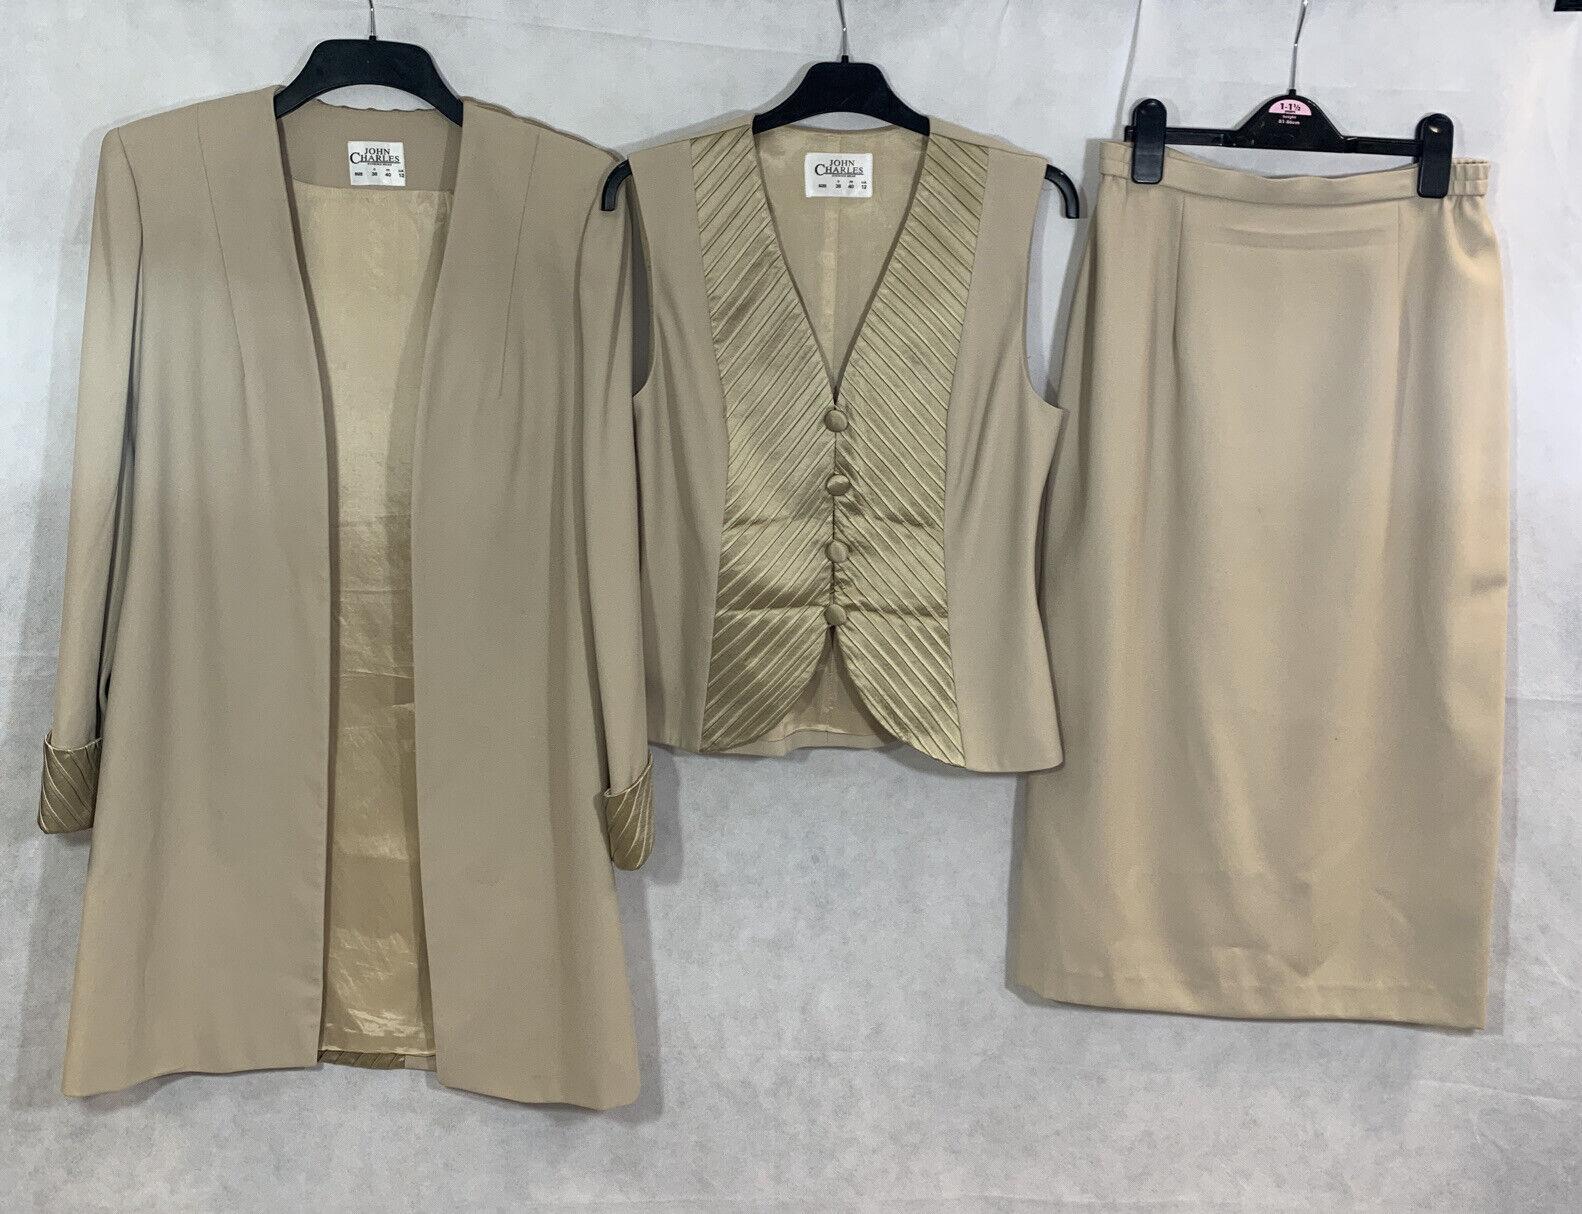 Women's John Charles Golden 3 Piece Occasion Skirt, Waistcoat, Jacket- Size 12